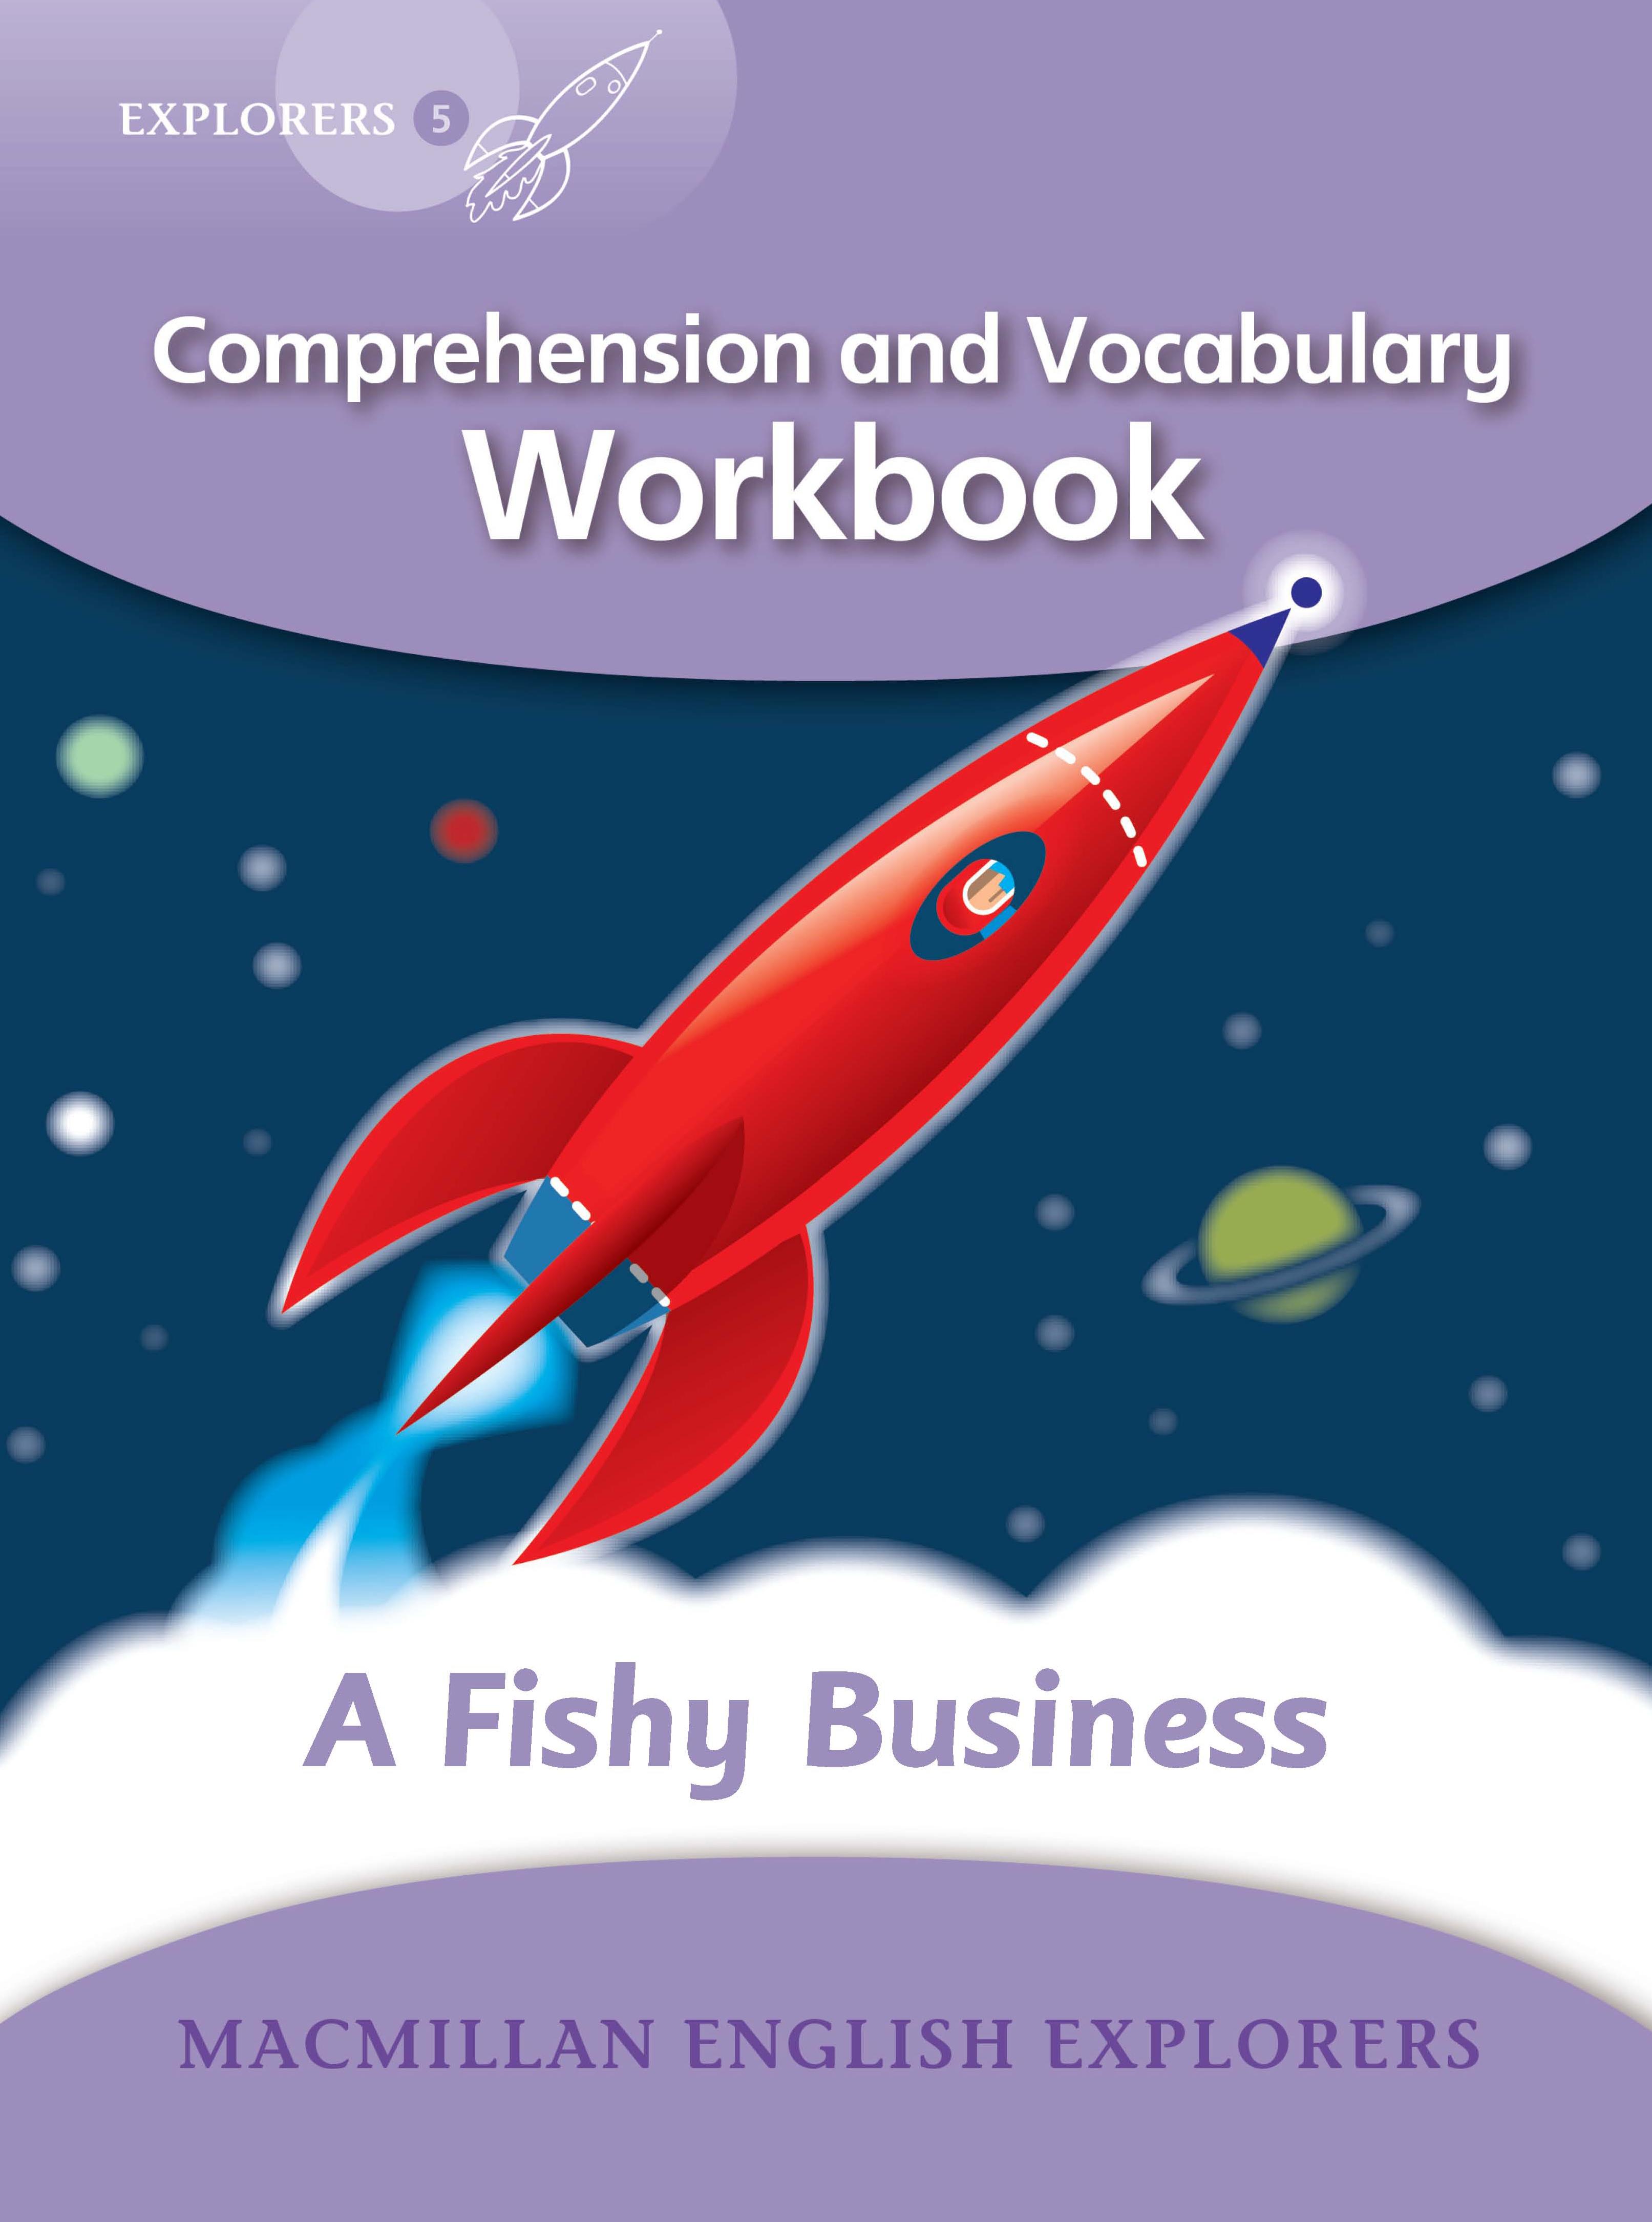 Explorers 5: A Fishy Business Workbook